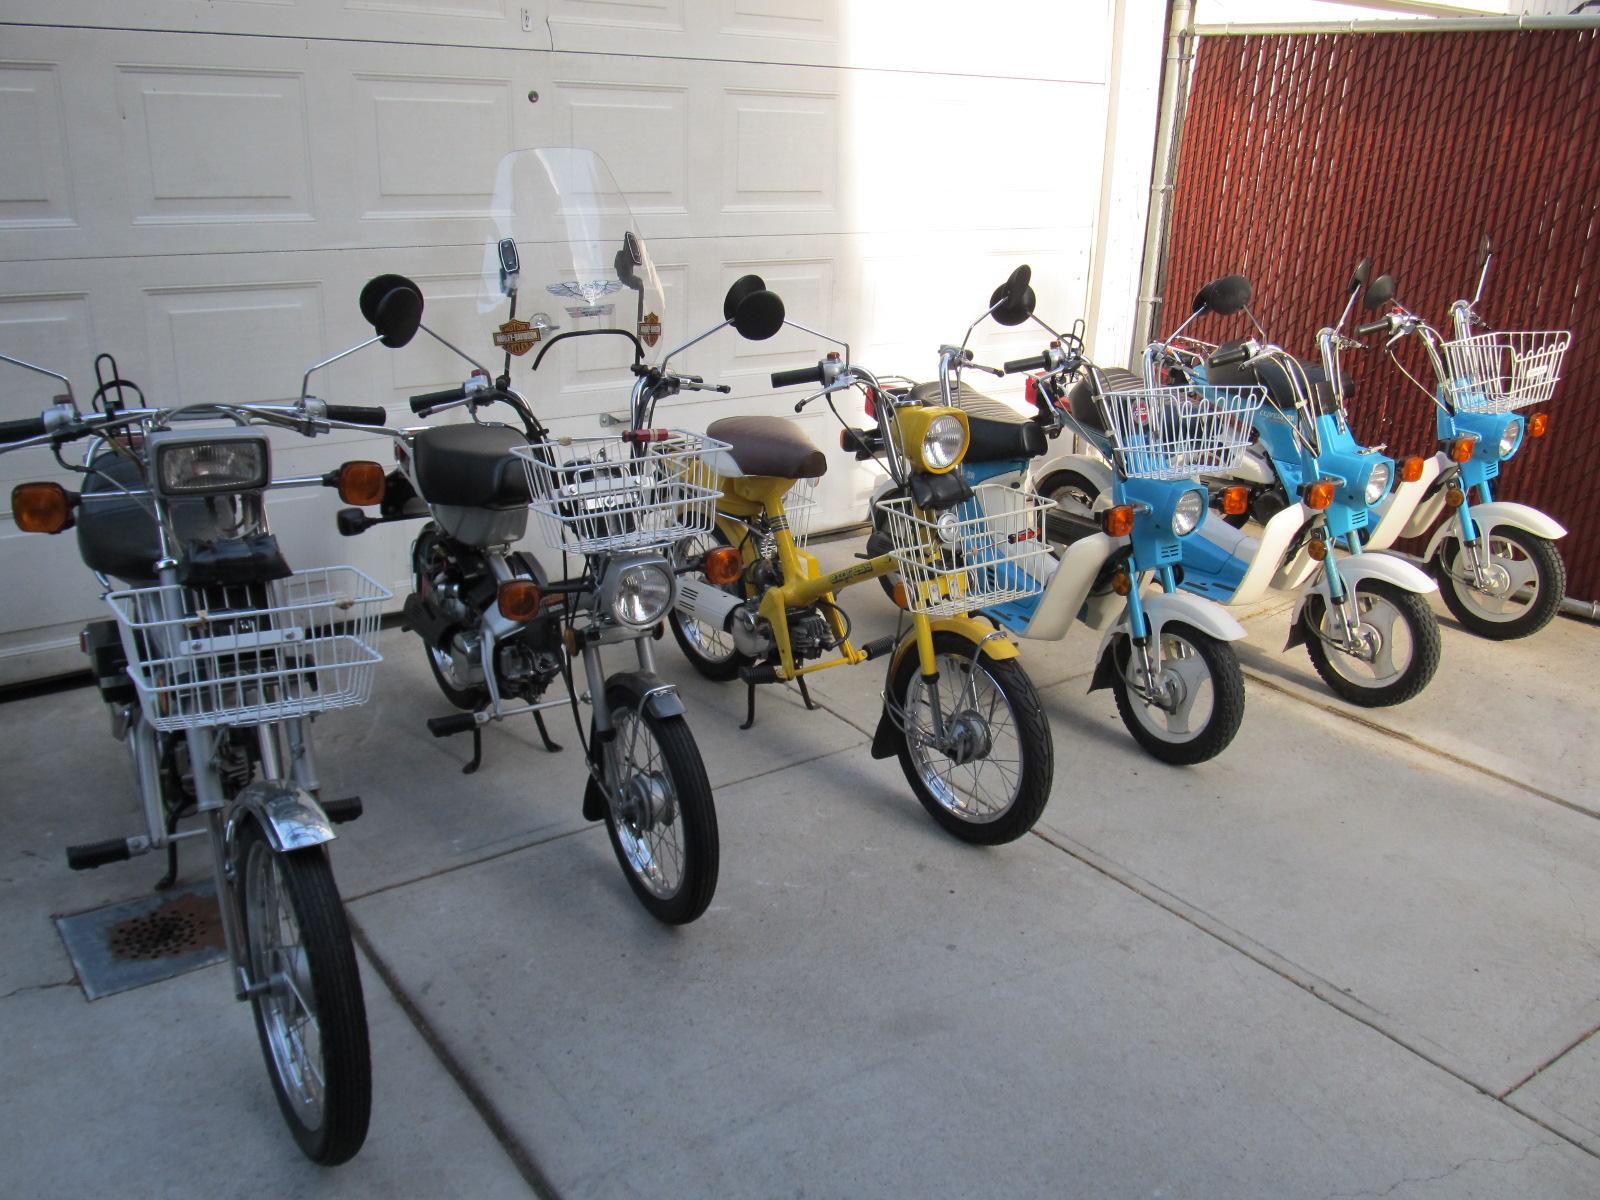 hight resolution of mopeds express18 mopeds 1982 honda express wiring diagram at cita asia